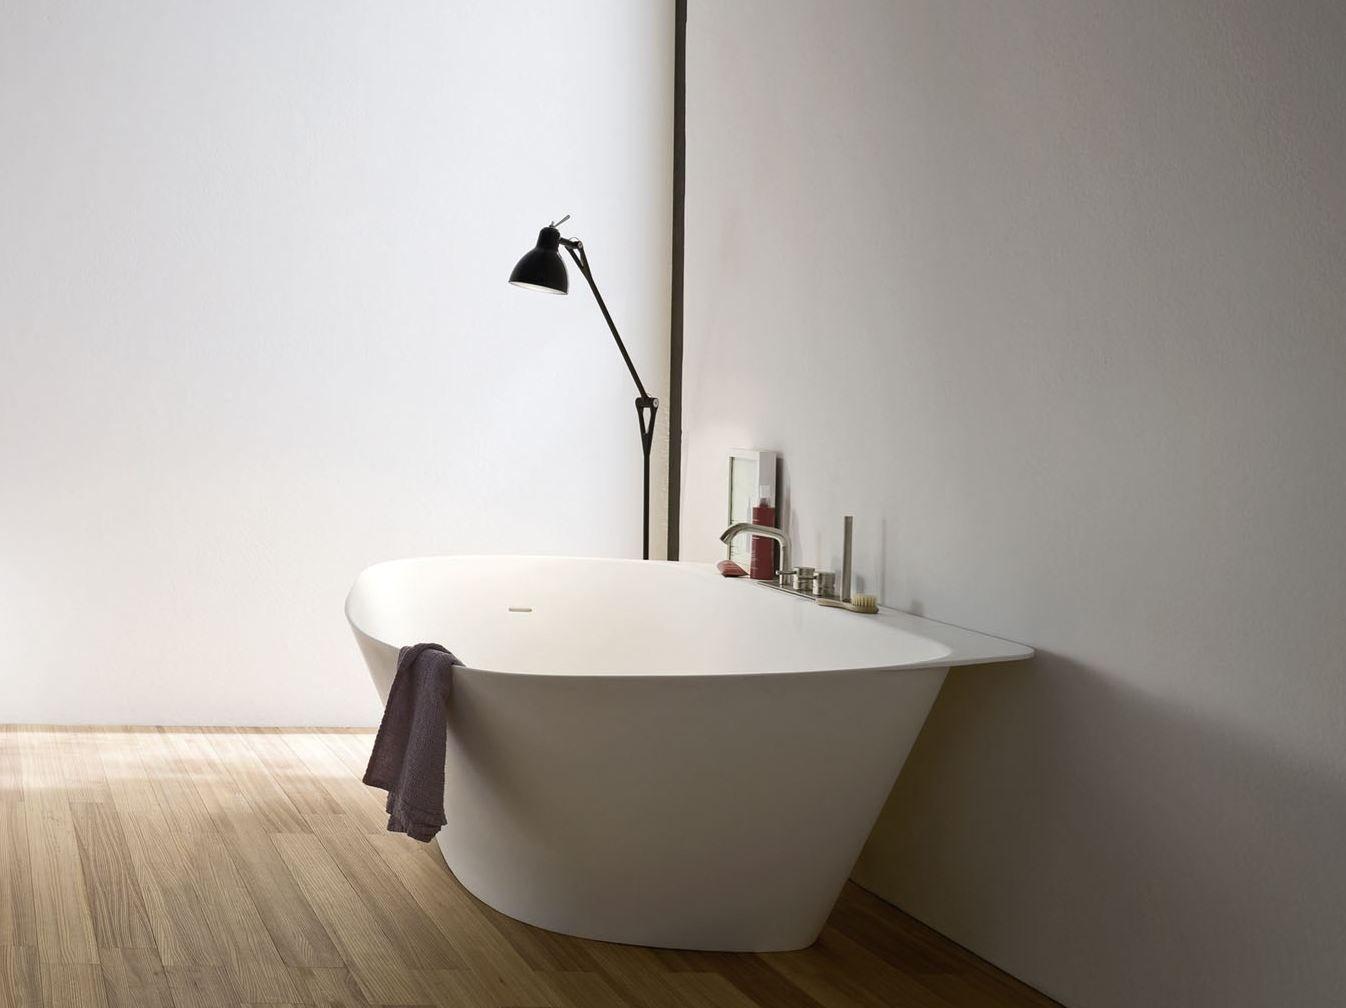 Bagno Giapponese ~ 68 best vasche da bagno images on pinterest bathroom bathrooms